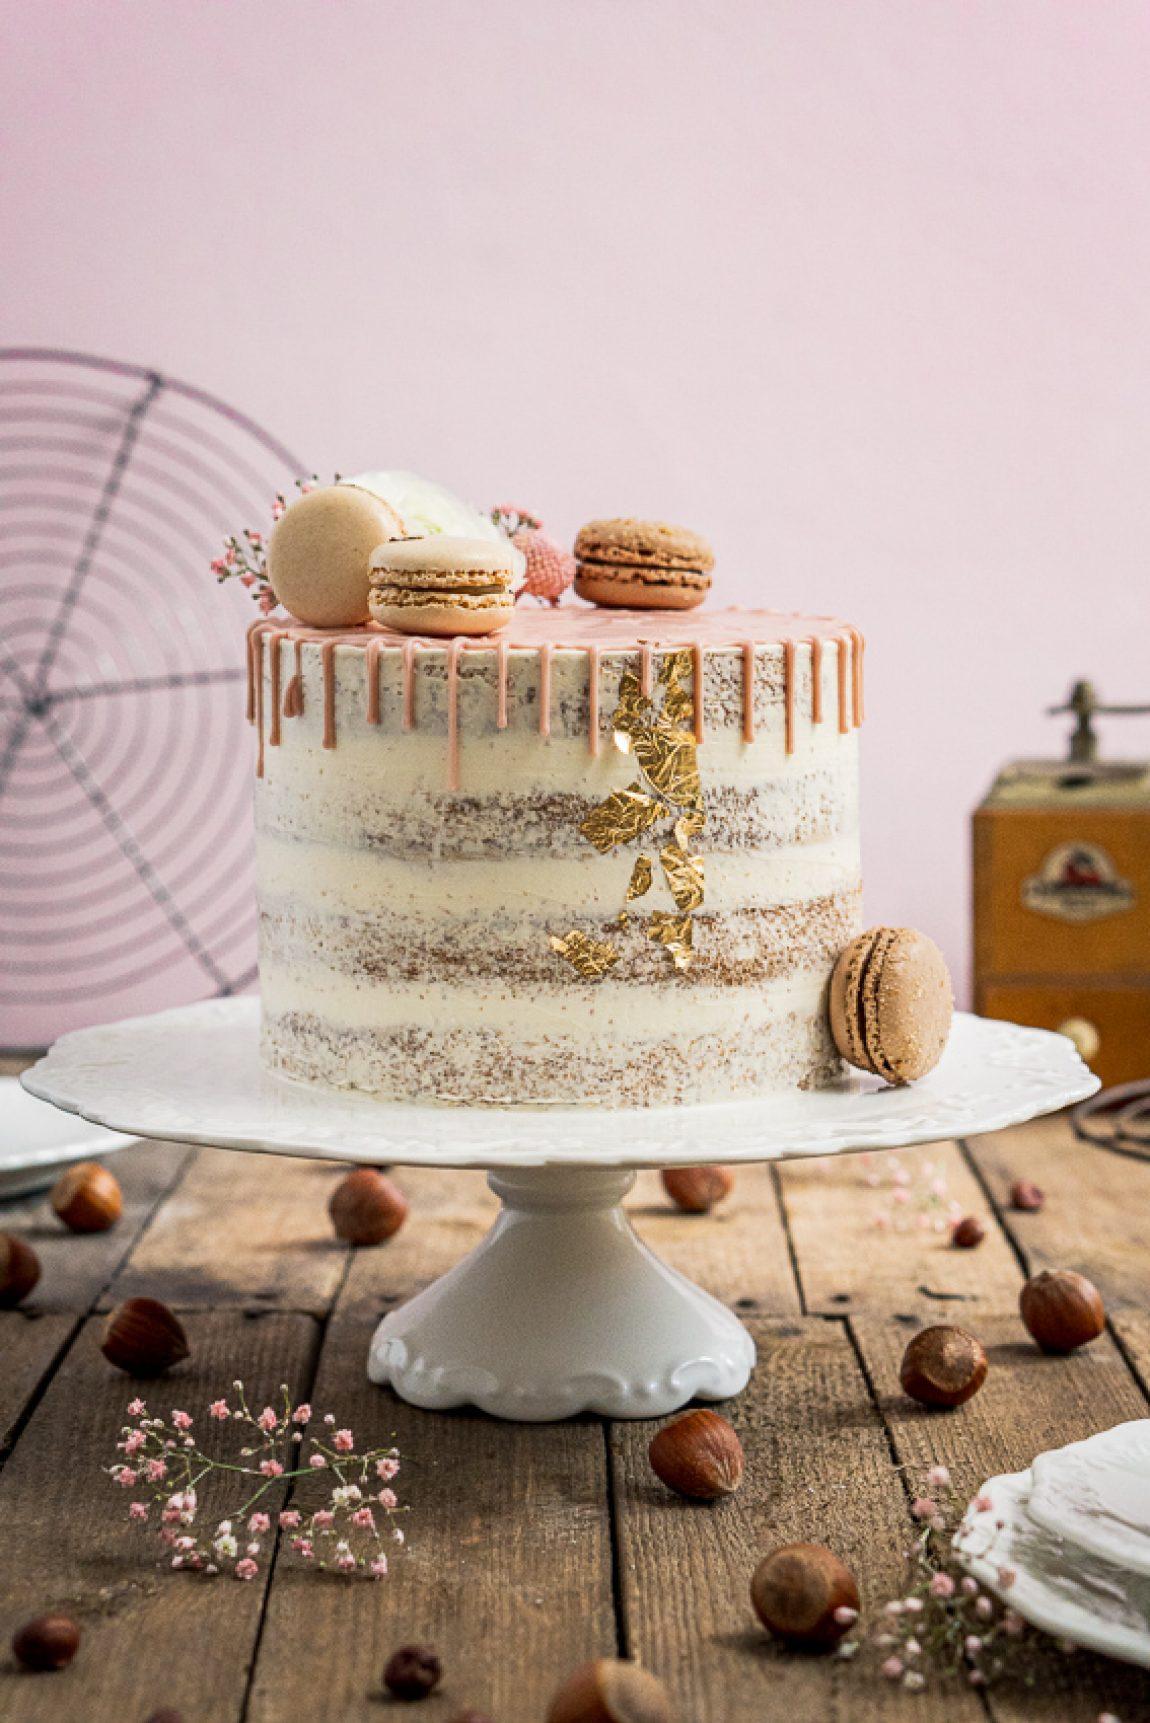 himbeer-praliné-torte-019